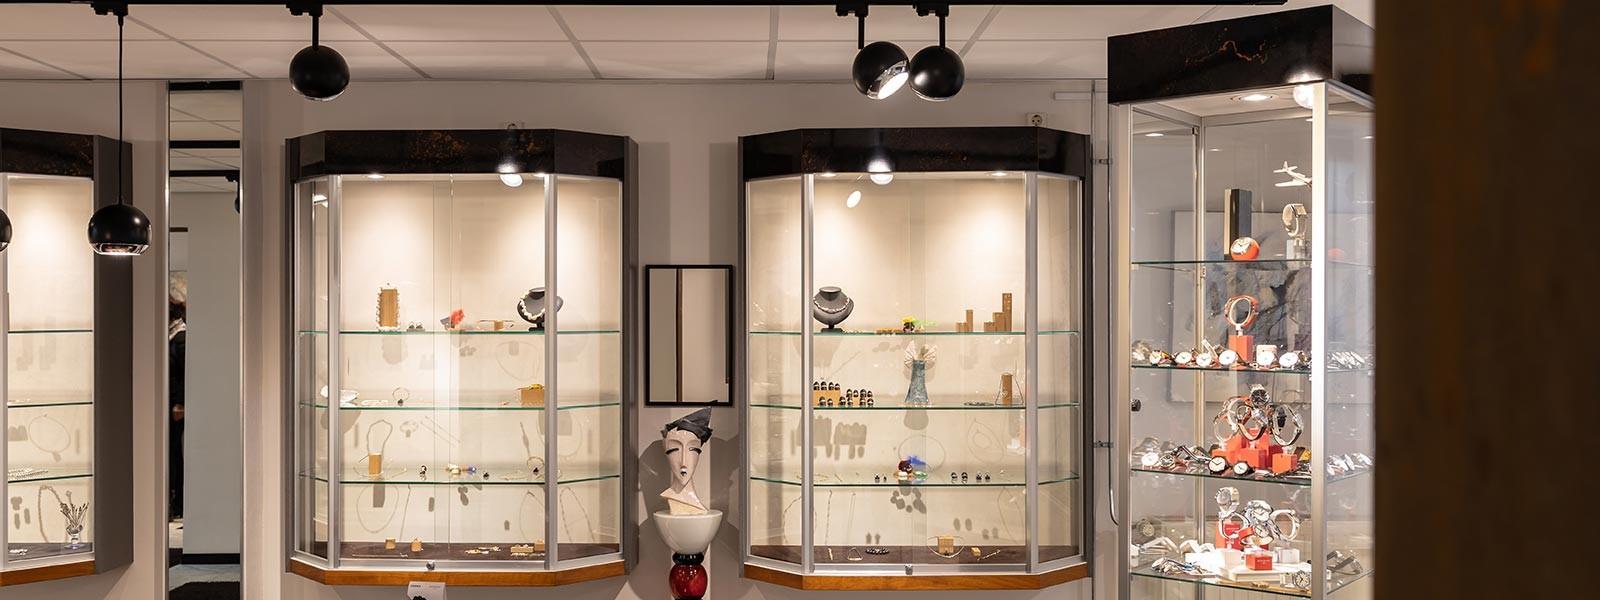 Frans Seelen juwelier, Venlo